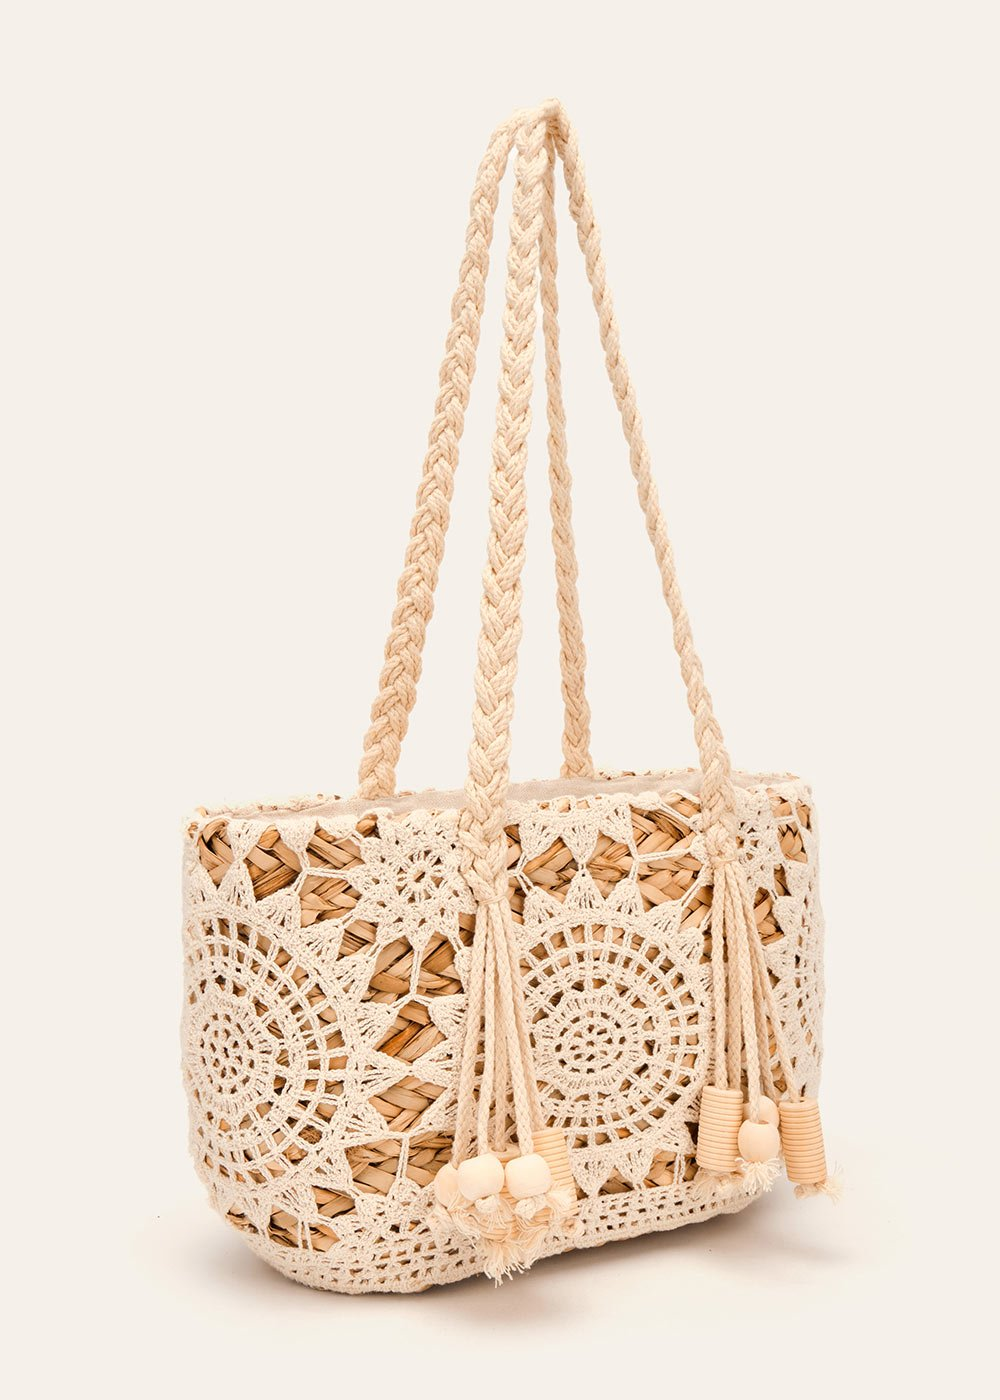 Bali crochet and straw bag - Safari  / Mousse - Woman